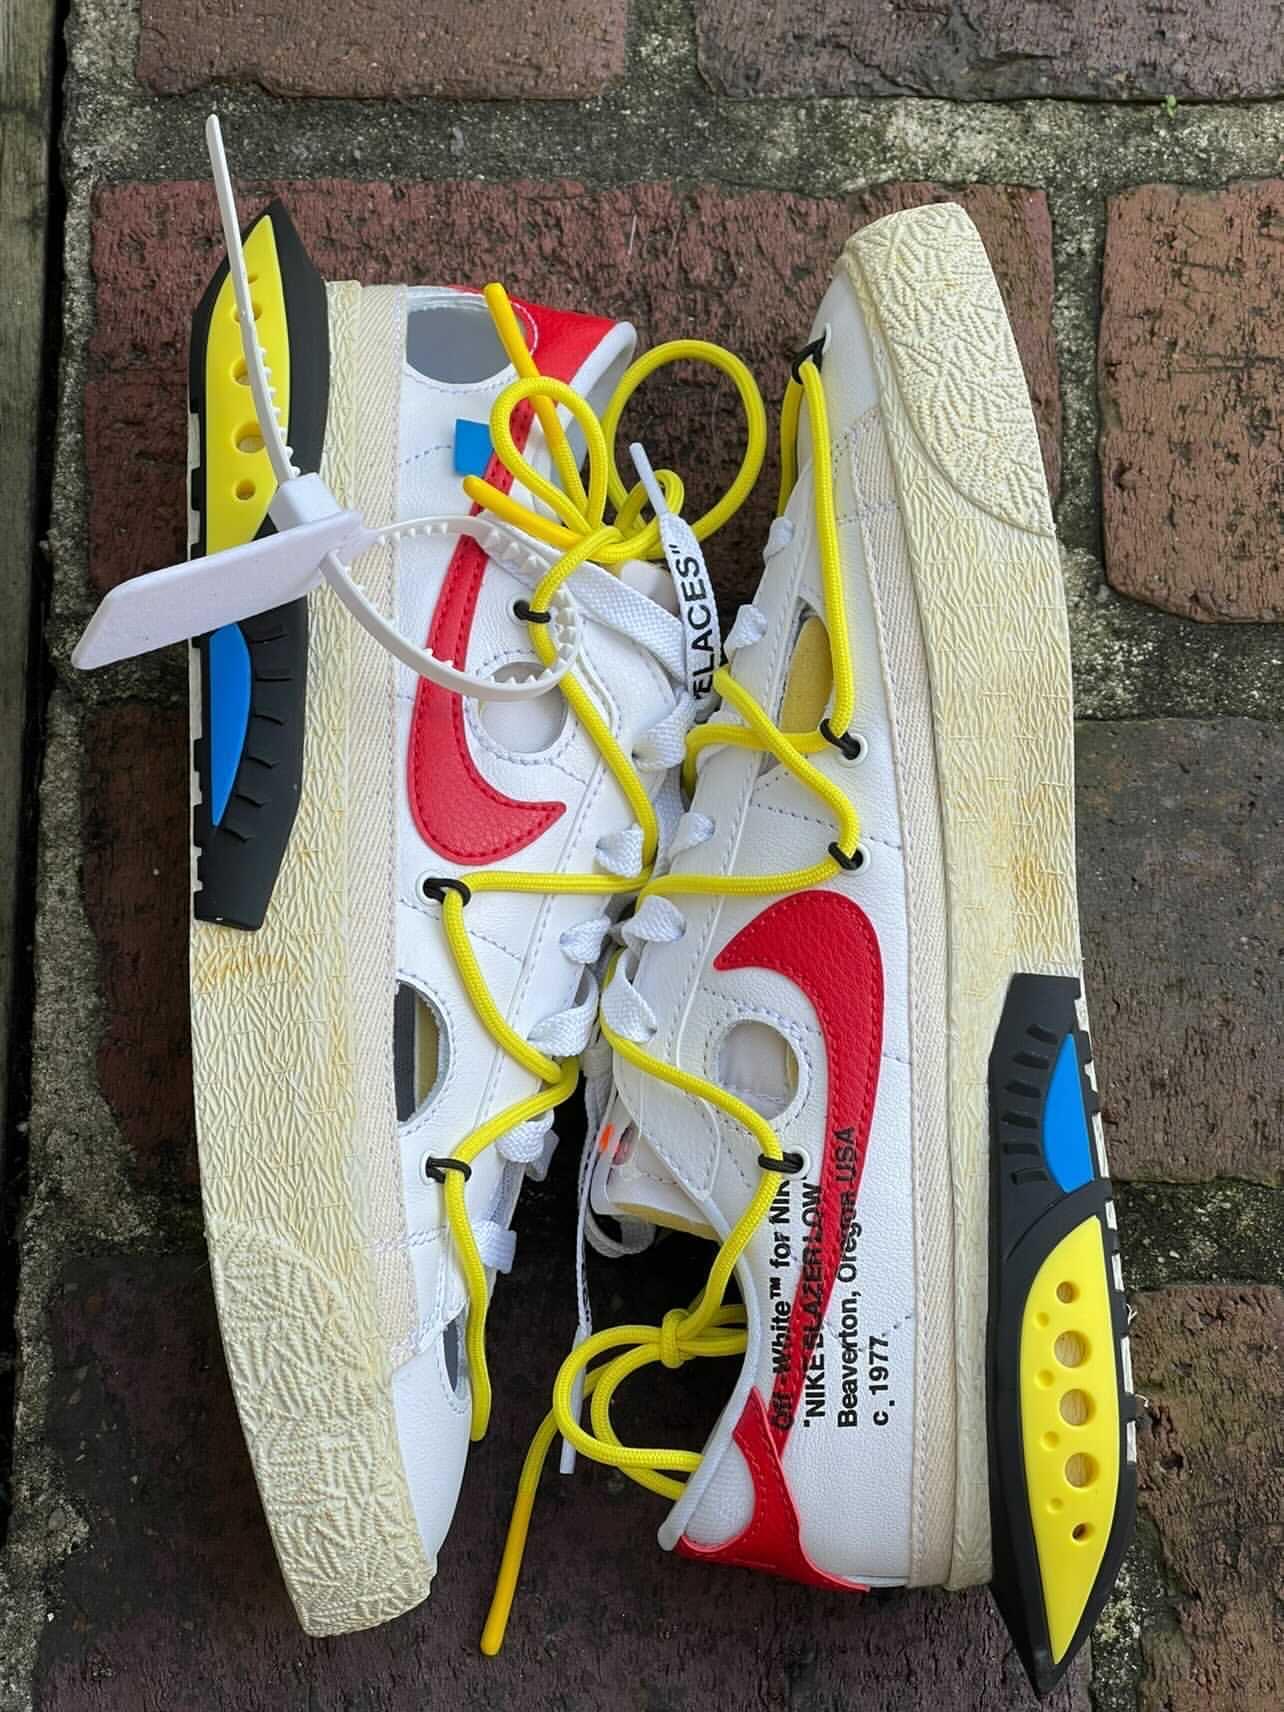 Off-White,Nike Blazer Low,DH78  最新实物图来了!OW x Blazer 将于今年发售!